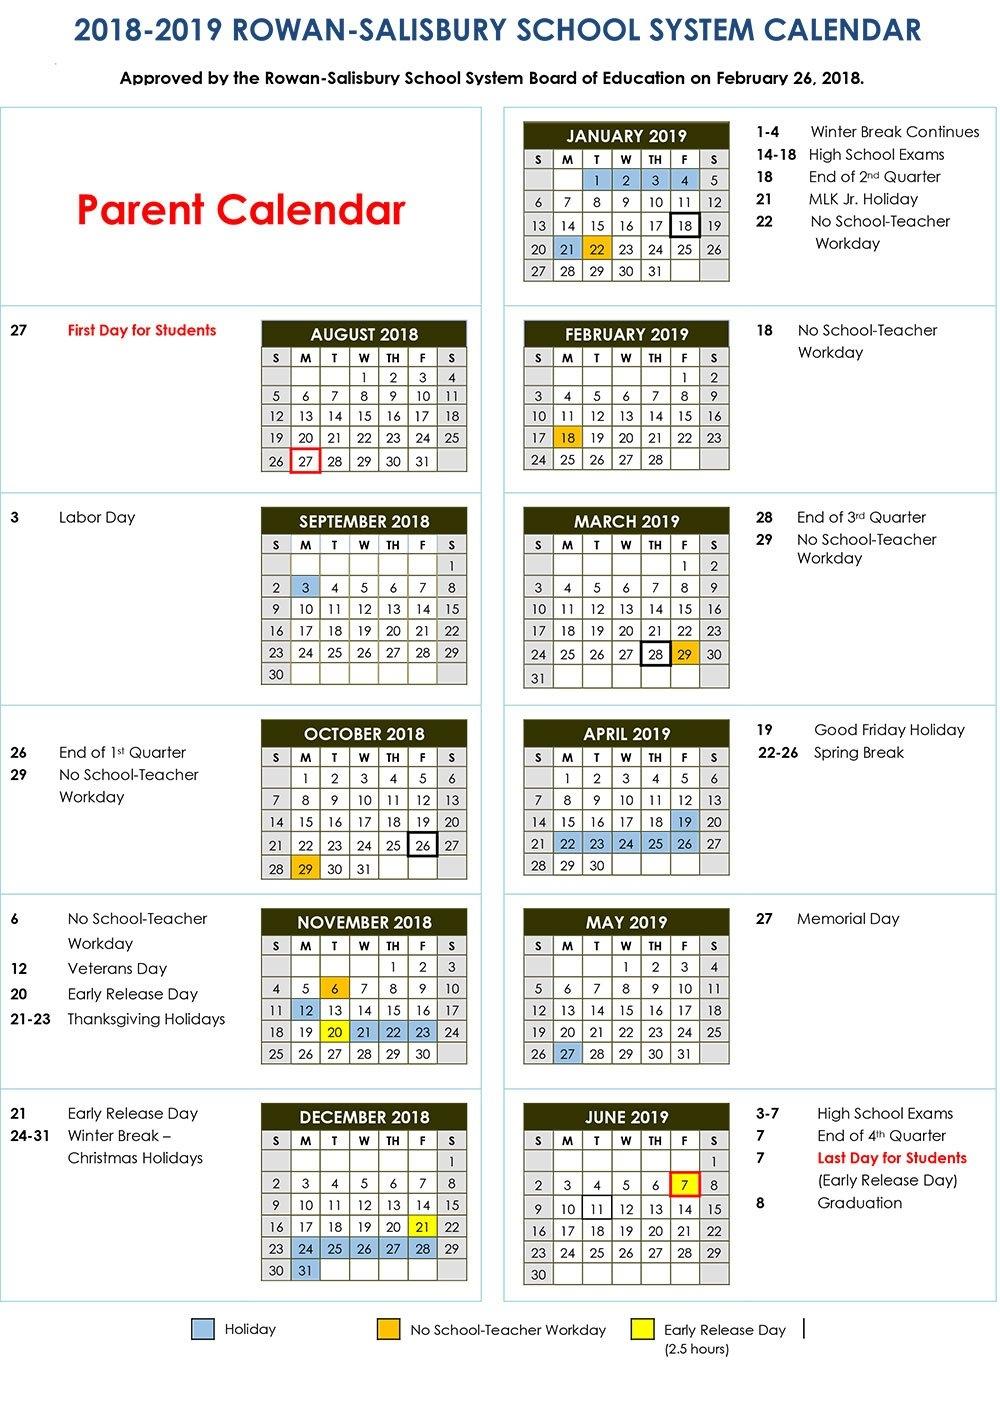 2018-2019 Calendars | District News Calendar 2019 Spring Break